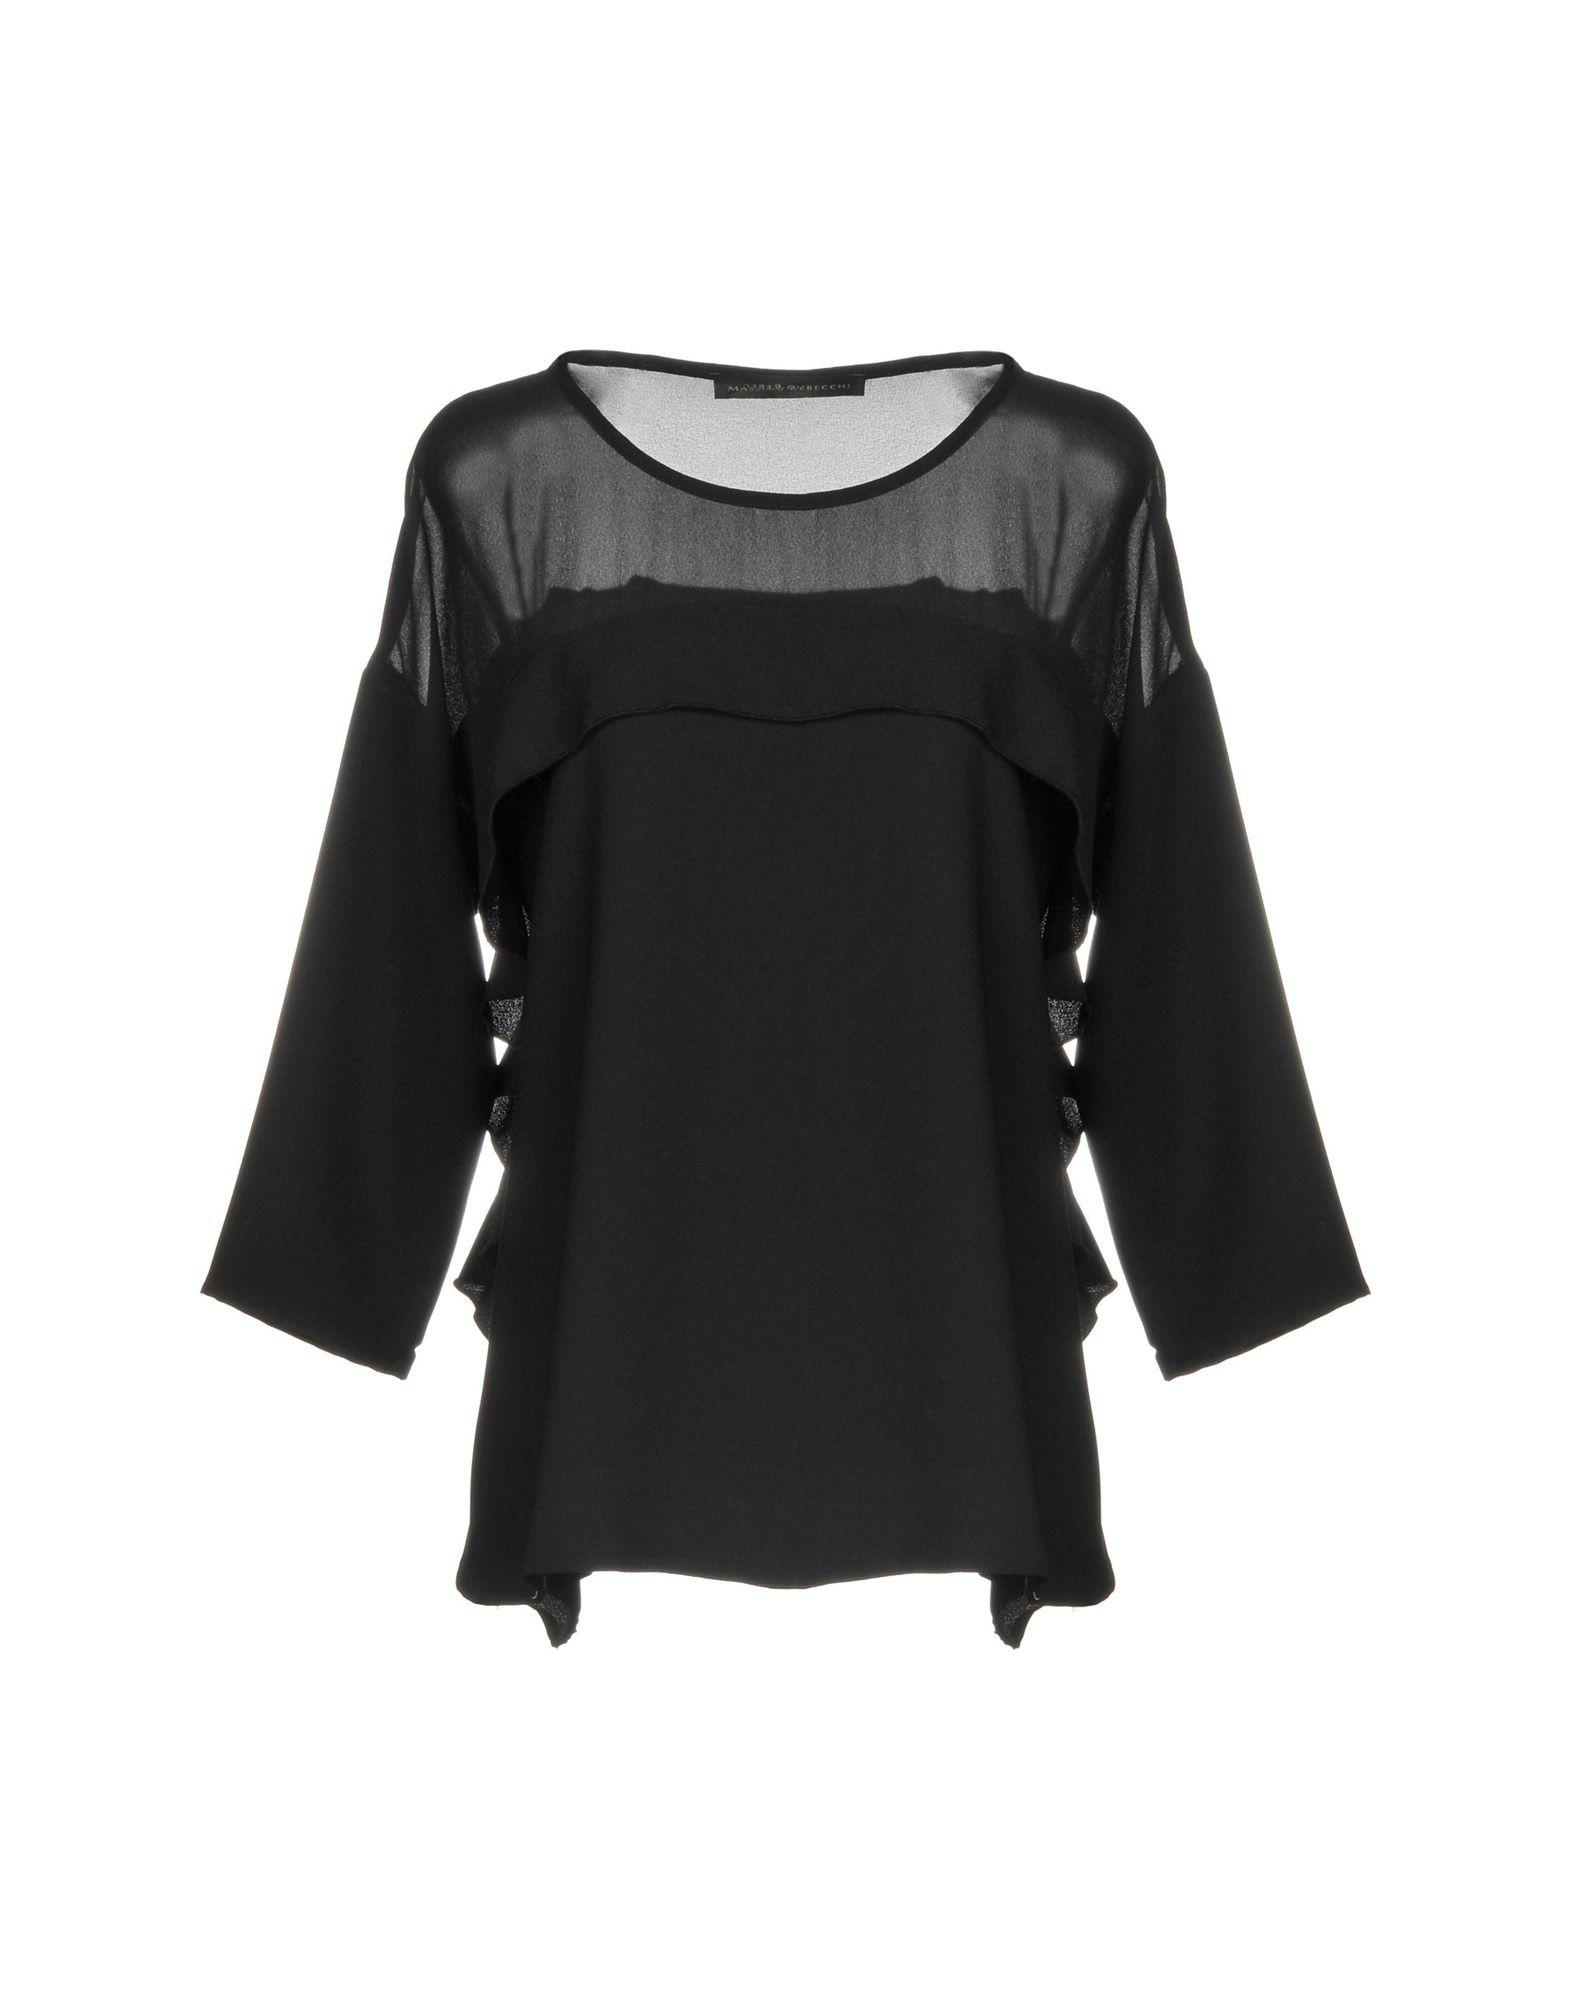 MASSIMO REBECCHI Блузка massimo rebecchi tdm платье до колена